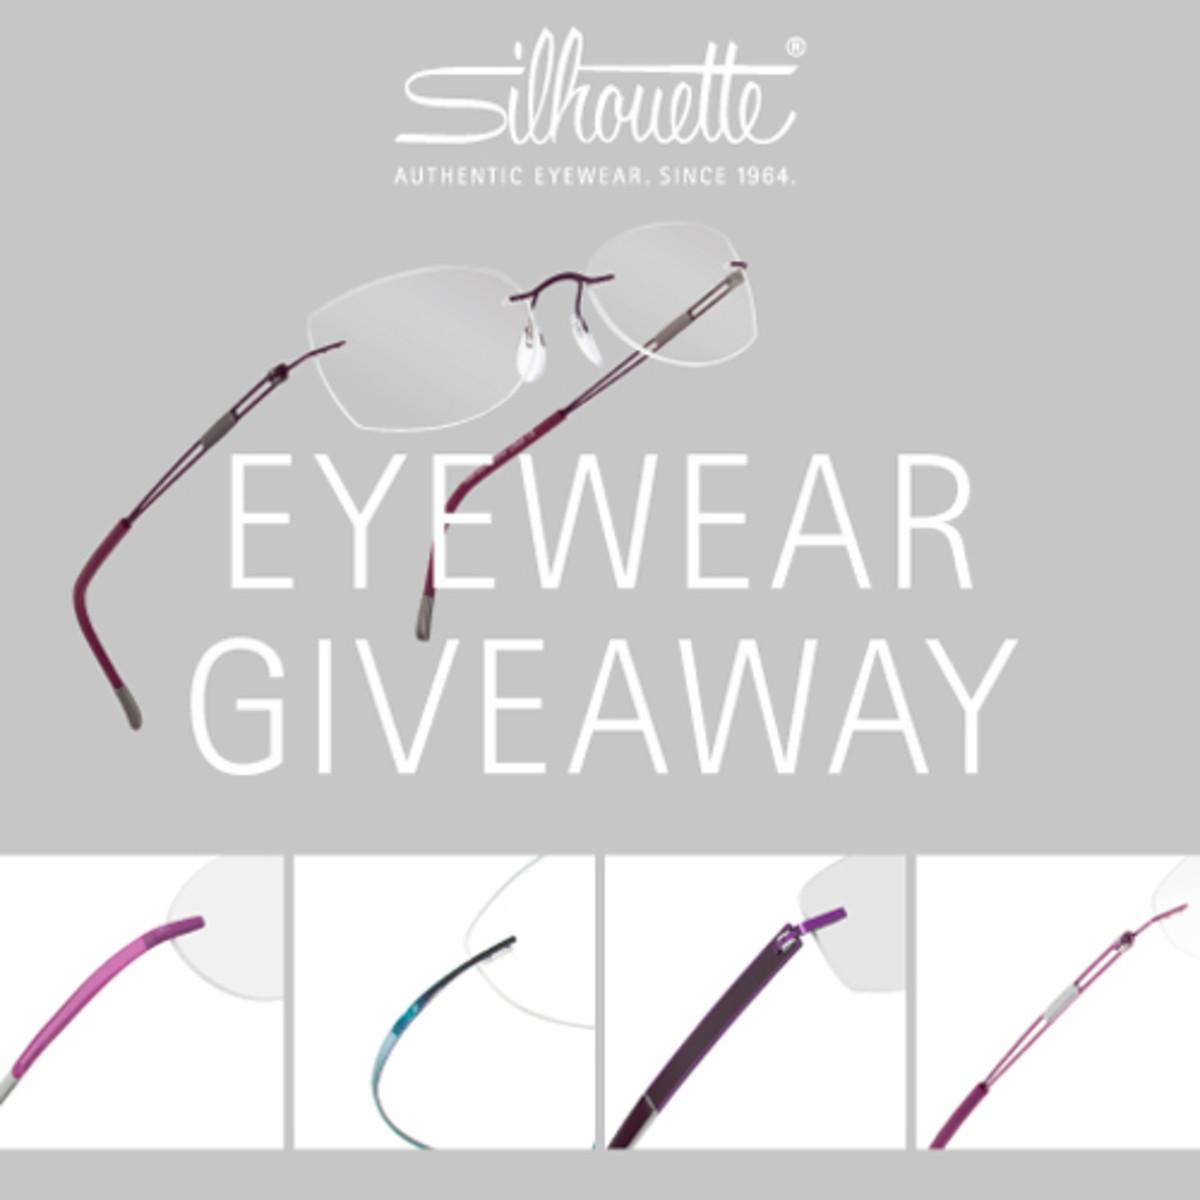 Silhouette Eyewear Giveaway